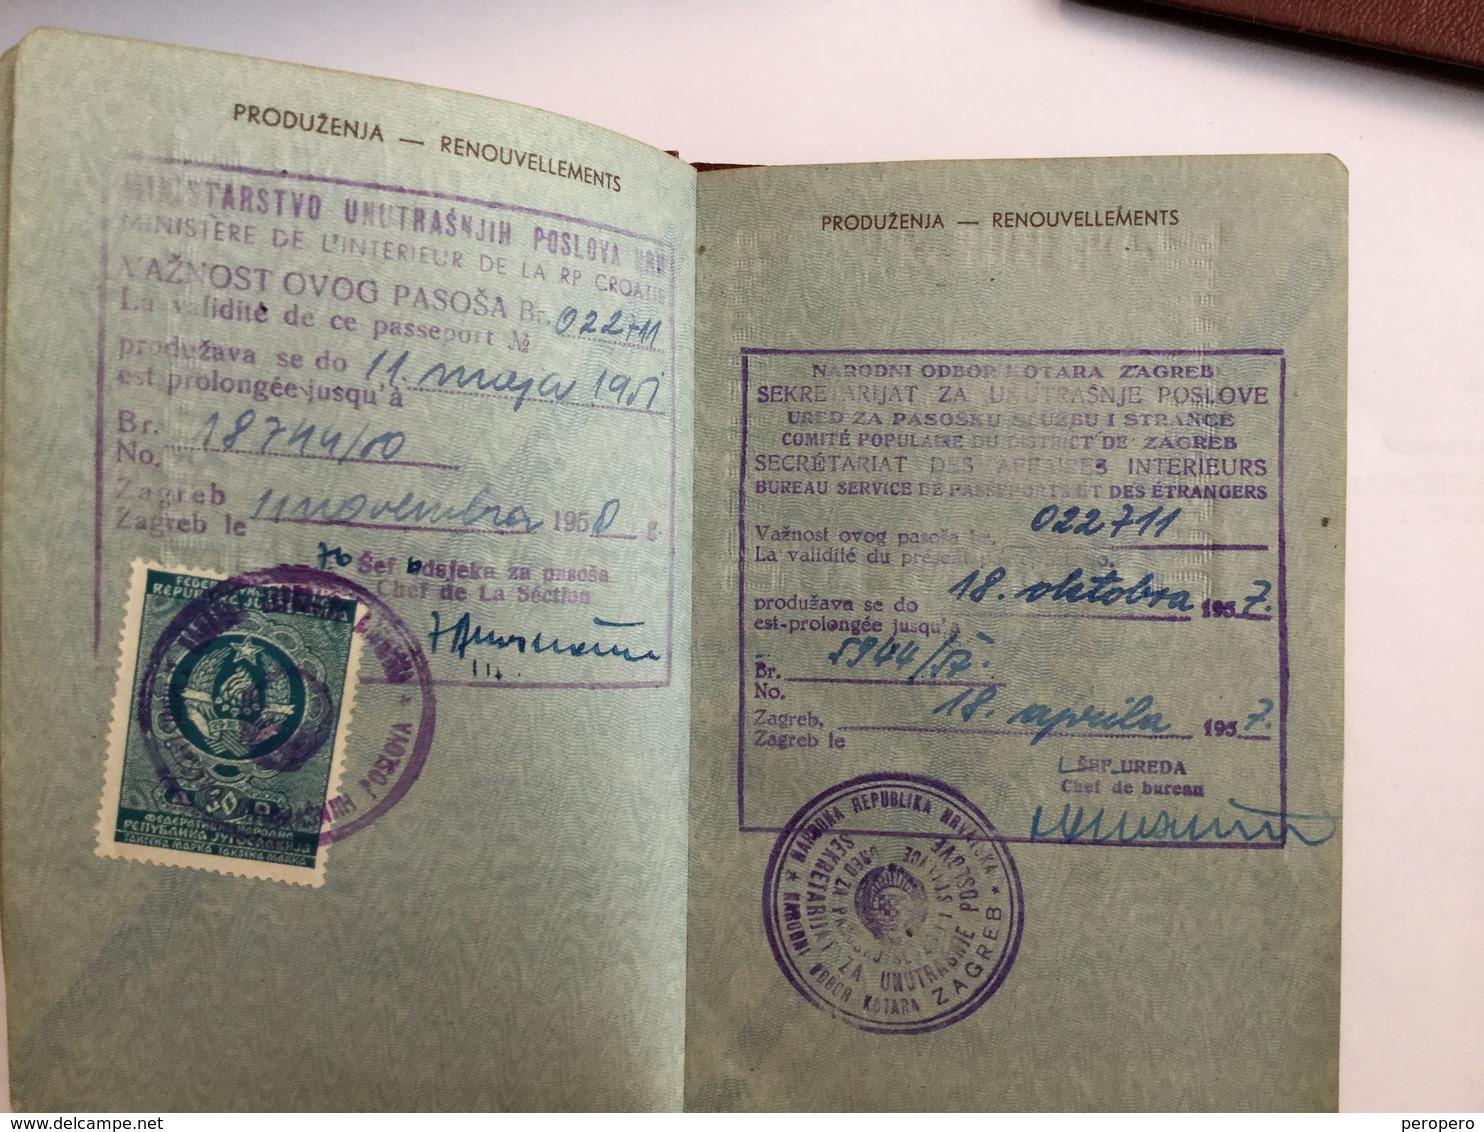 PASSPORT   REISEPASS  PASSAPORTO   PASSEPORT FNRJ   JUGOSLAVIJA  YUGOSLAVIA 1950 VISA TO: AUSTRIA, GERMANY, Switzerland, - Historische Dokumente